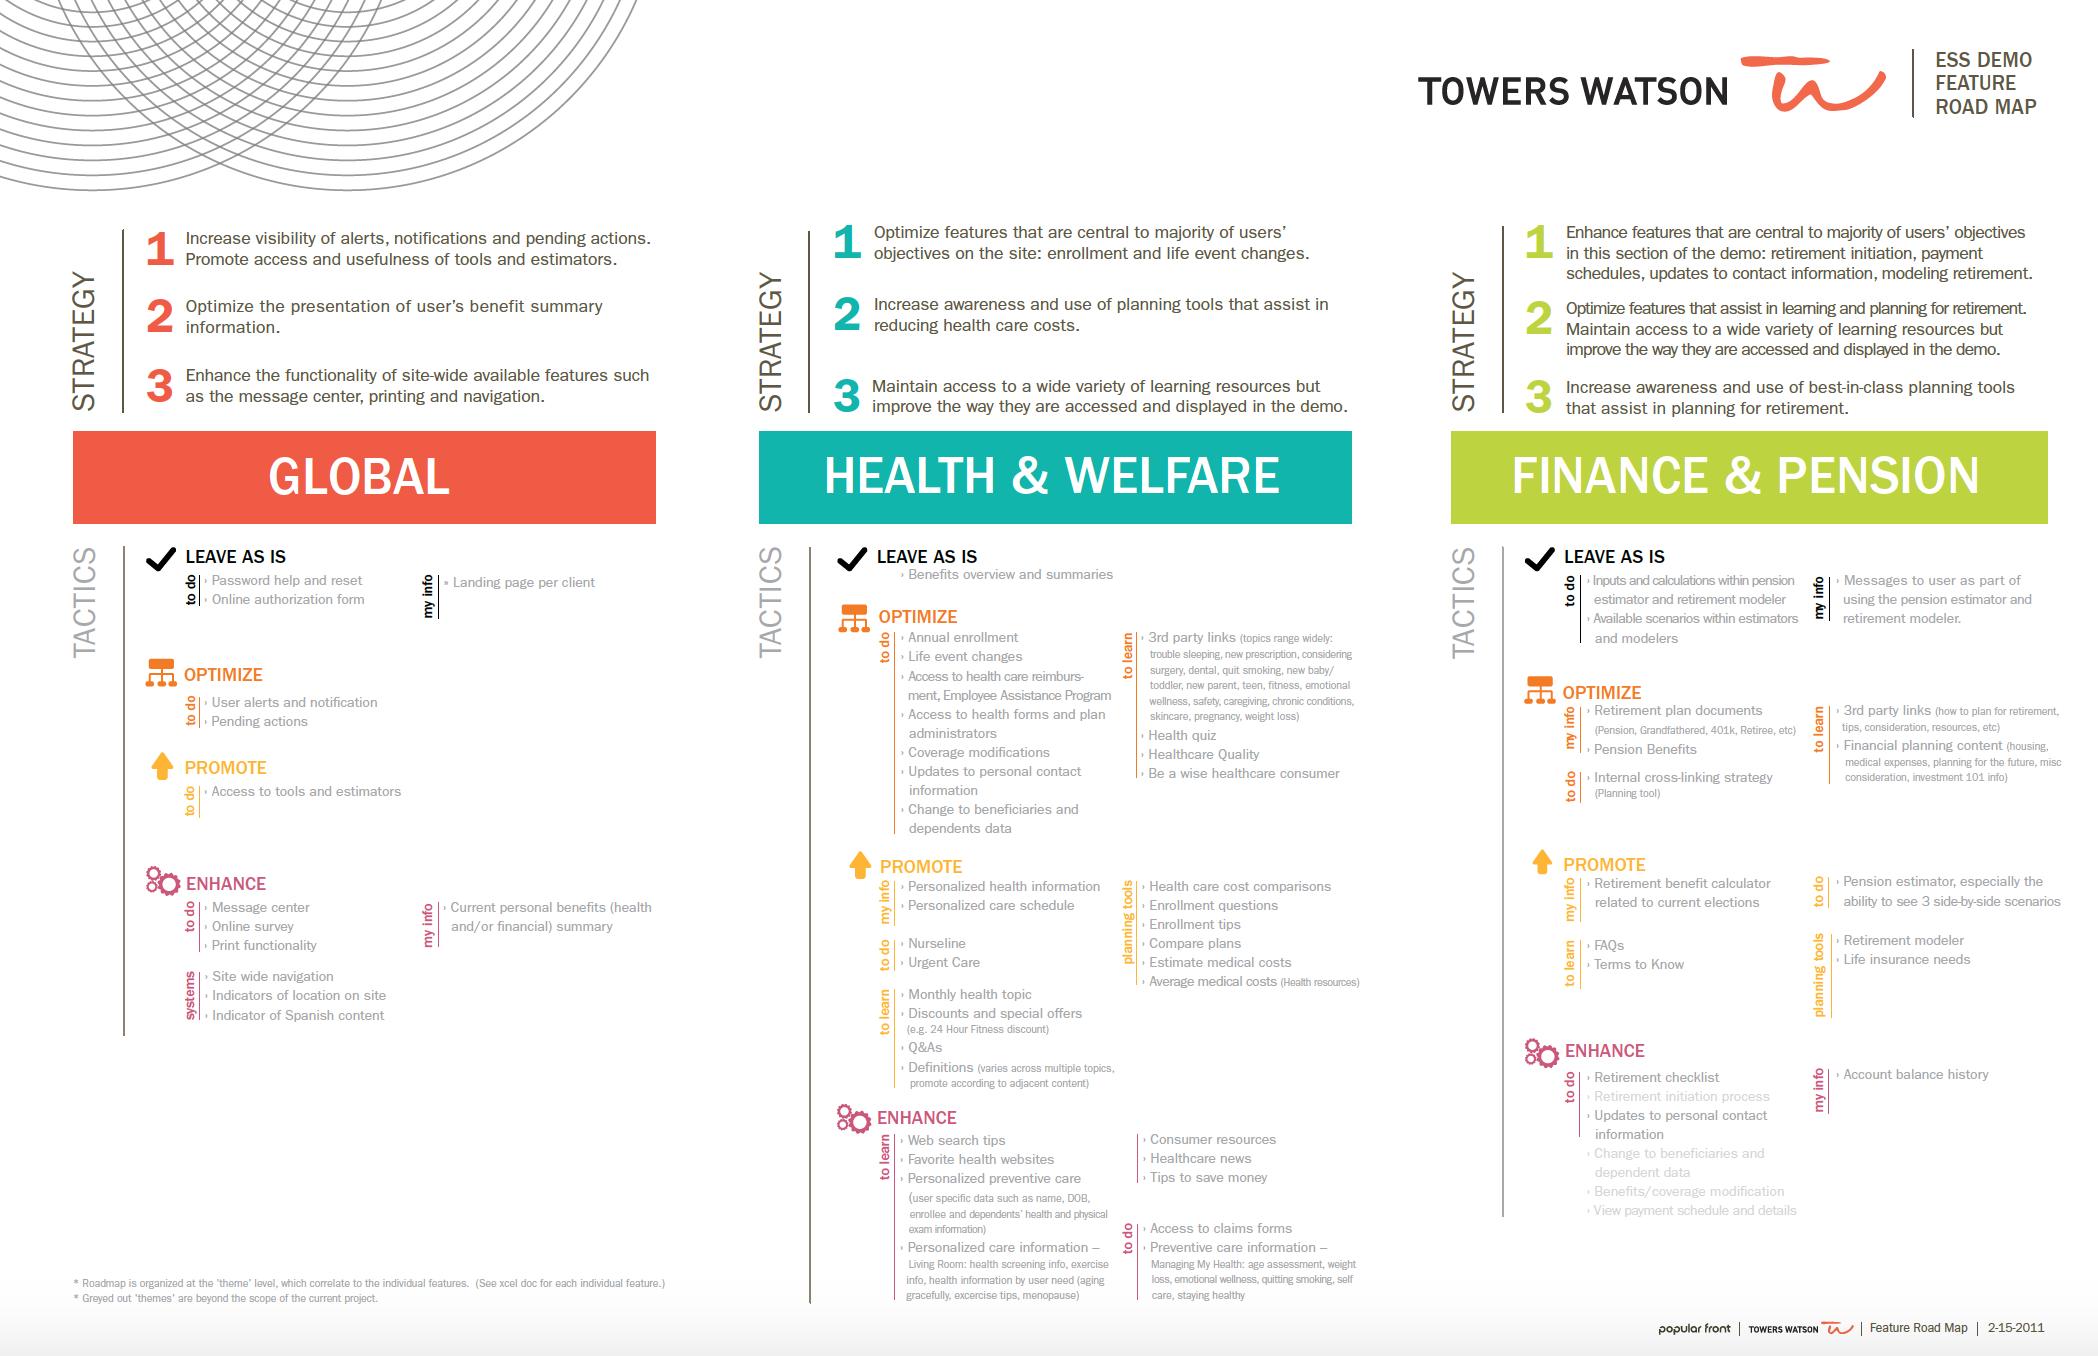 Towers Watson ESS (Employee Self Service) Demo Roadmap